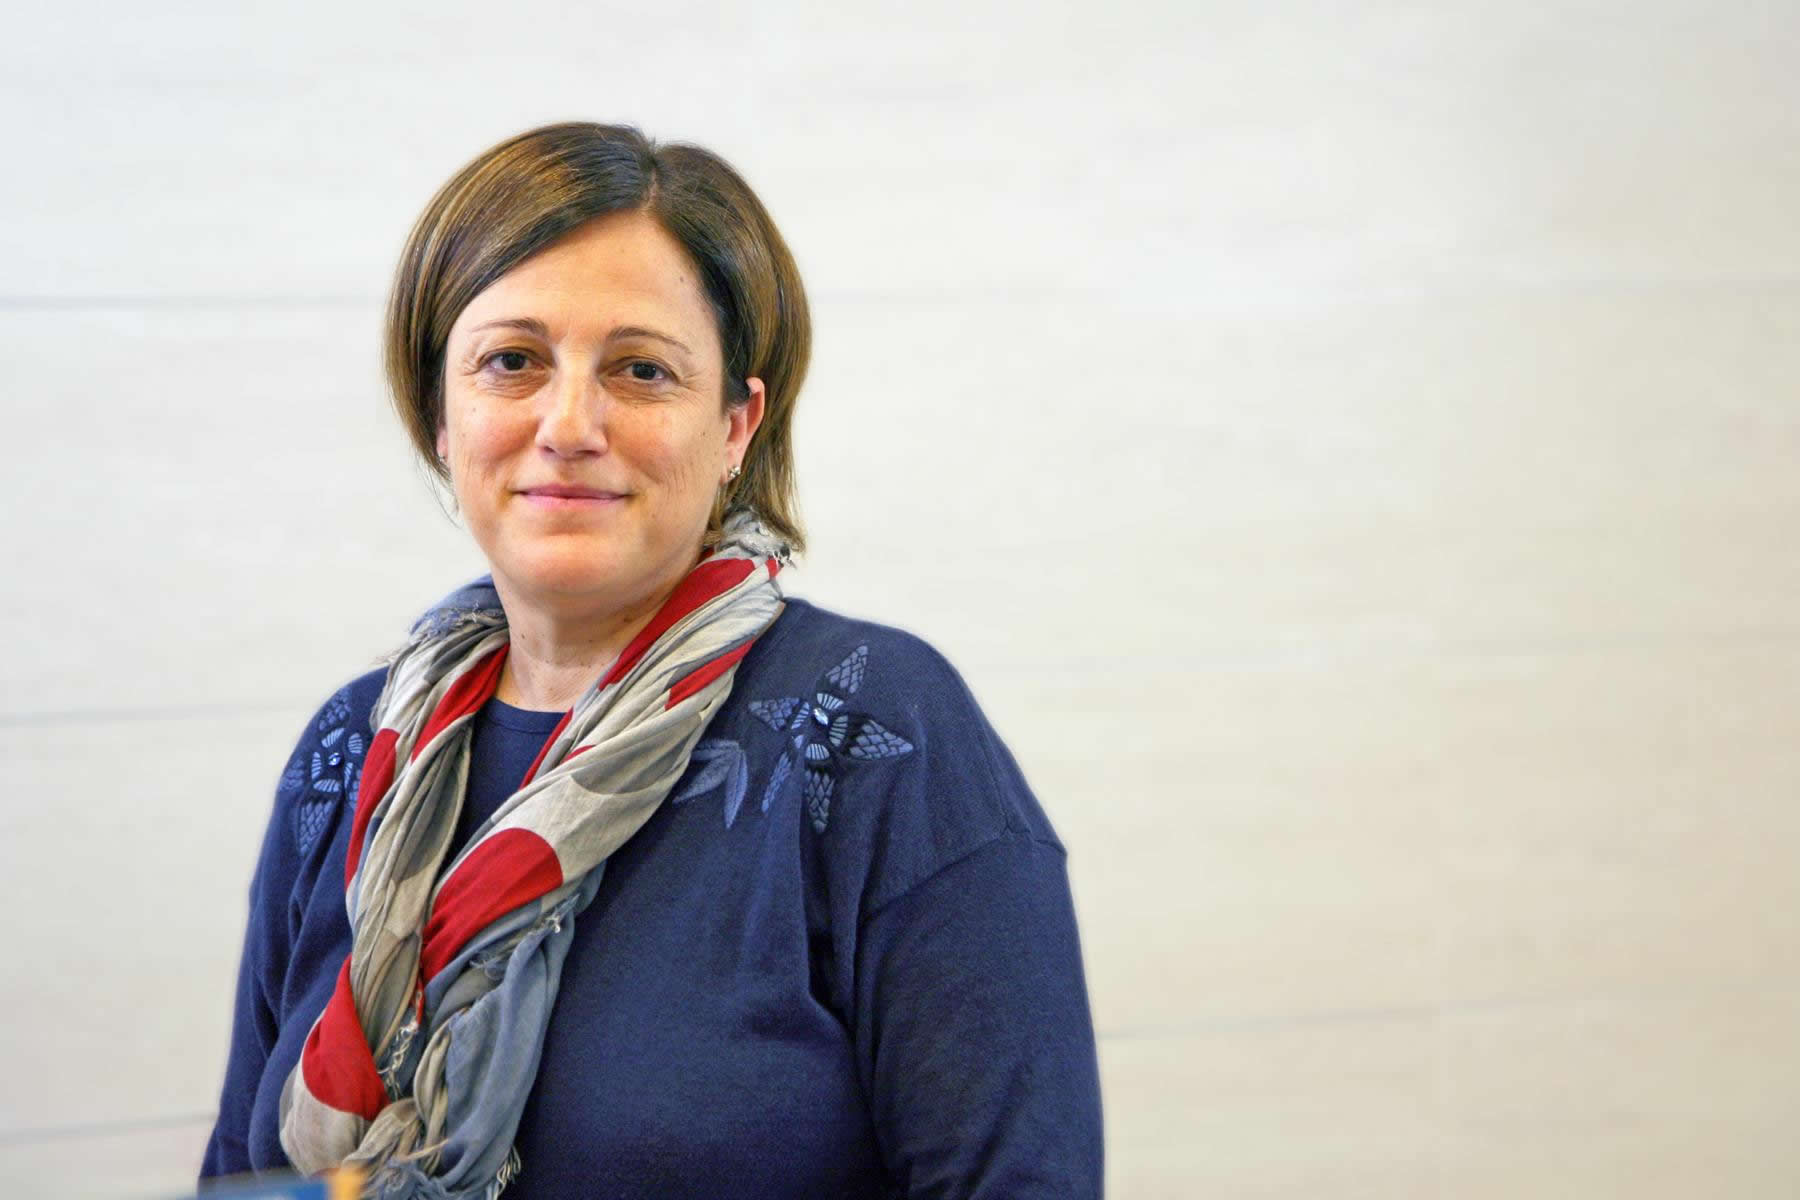 Cristina Margnini